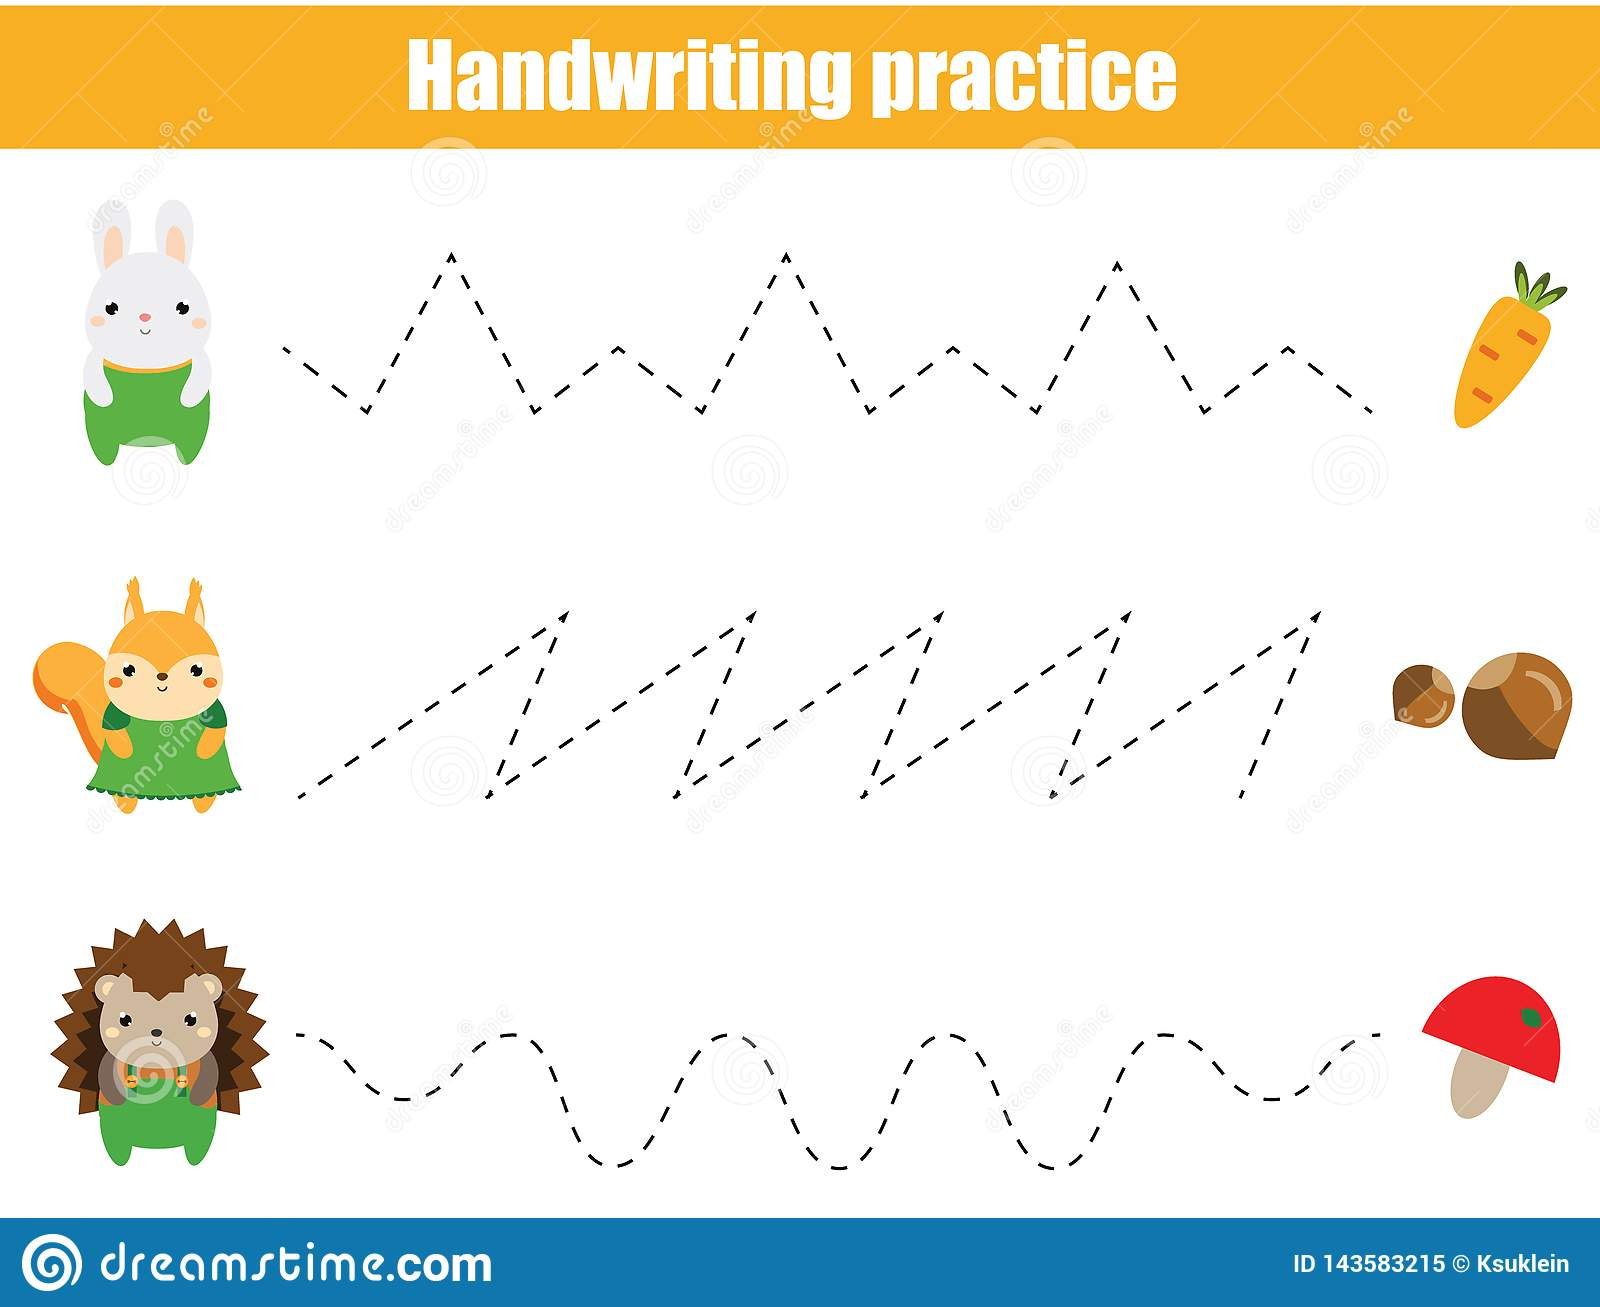 Preschool Handwriting Practice Sheet. Educational Children